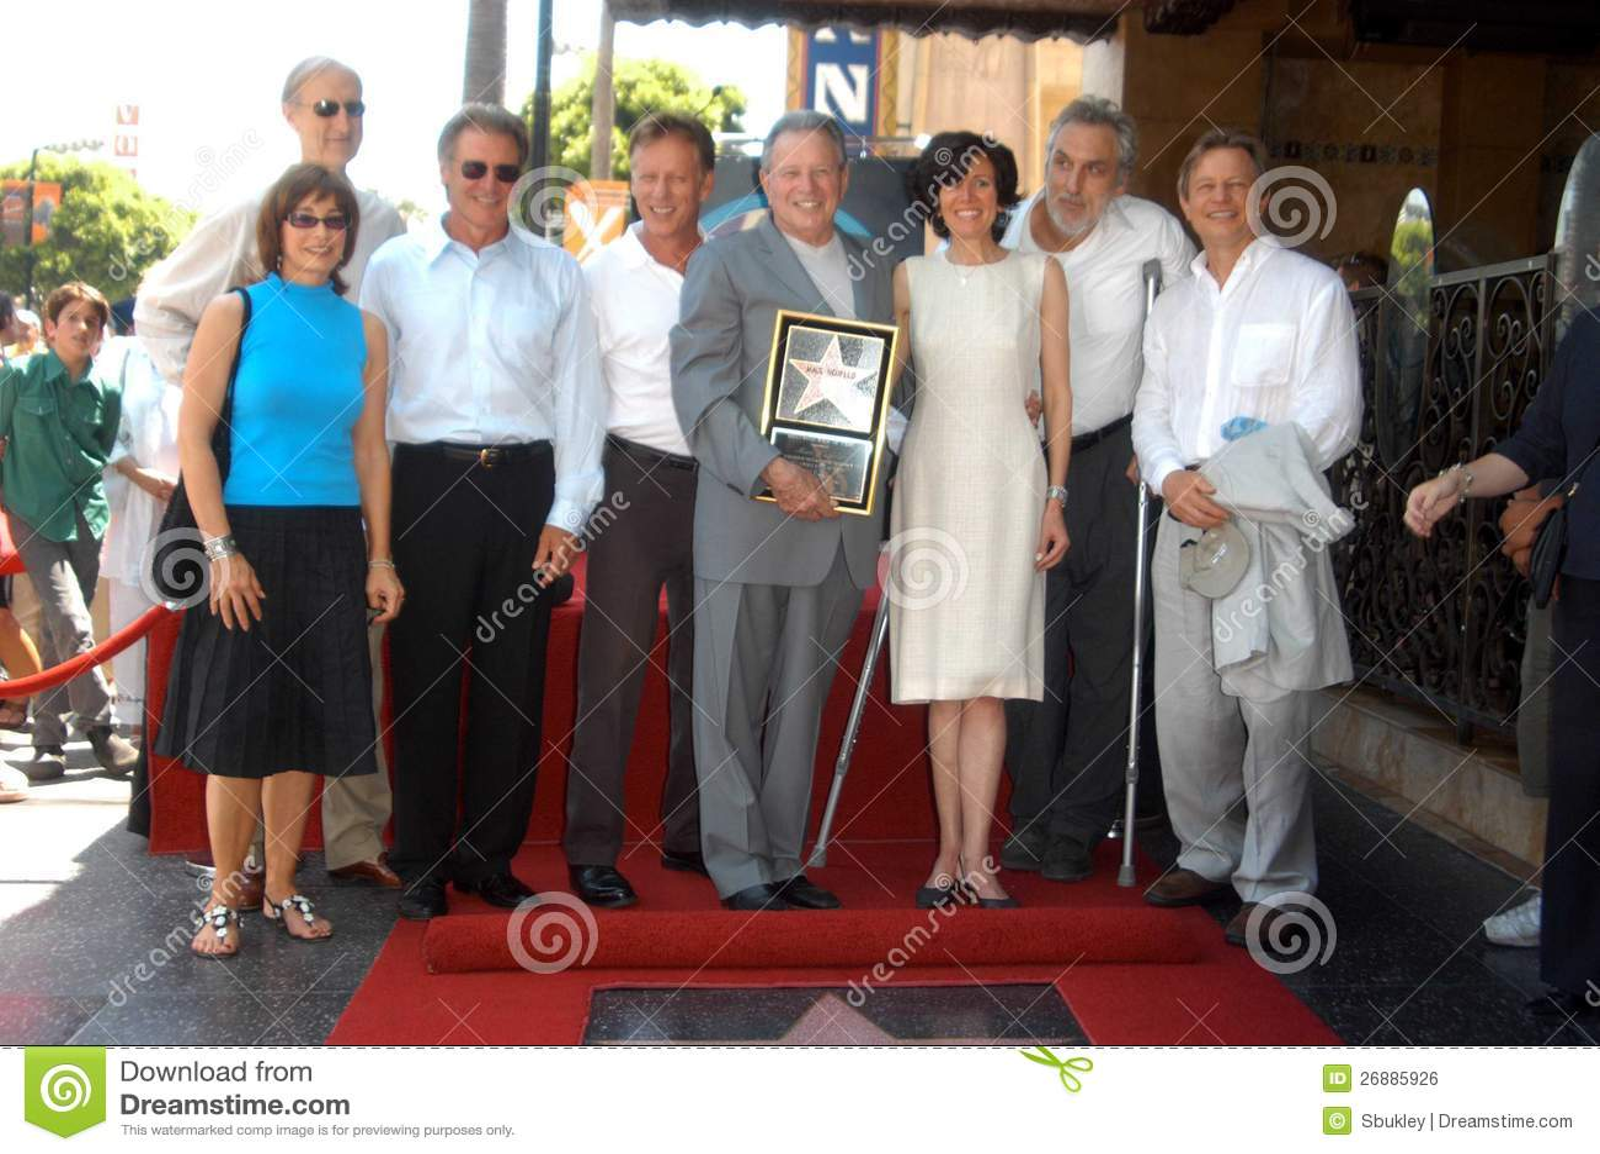 Anne Archer, James Cromwell, Harrison Ford, madeiras de James, Mace Neufeld, Michael York